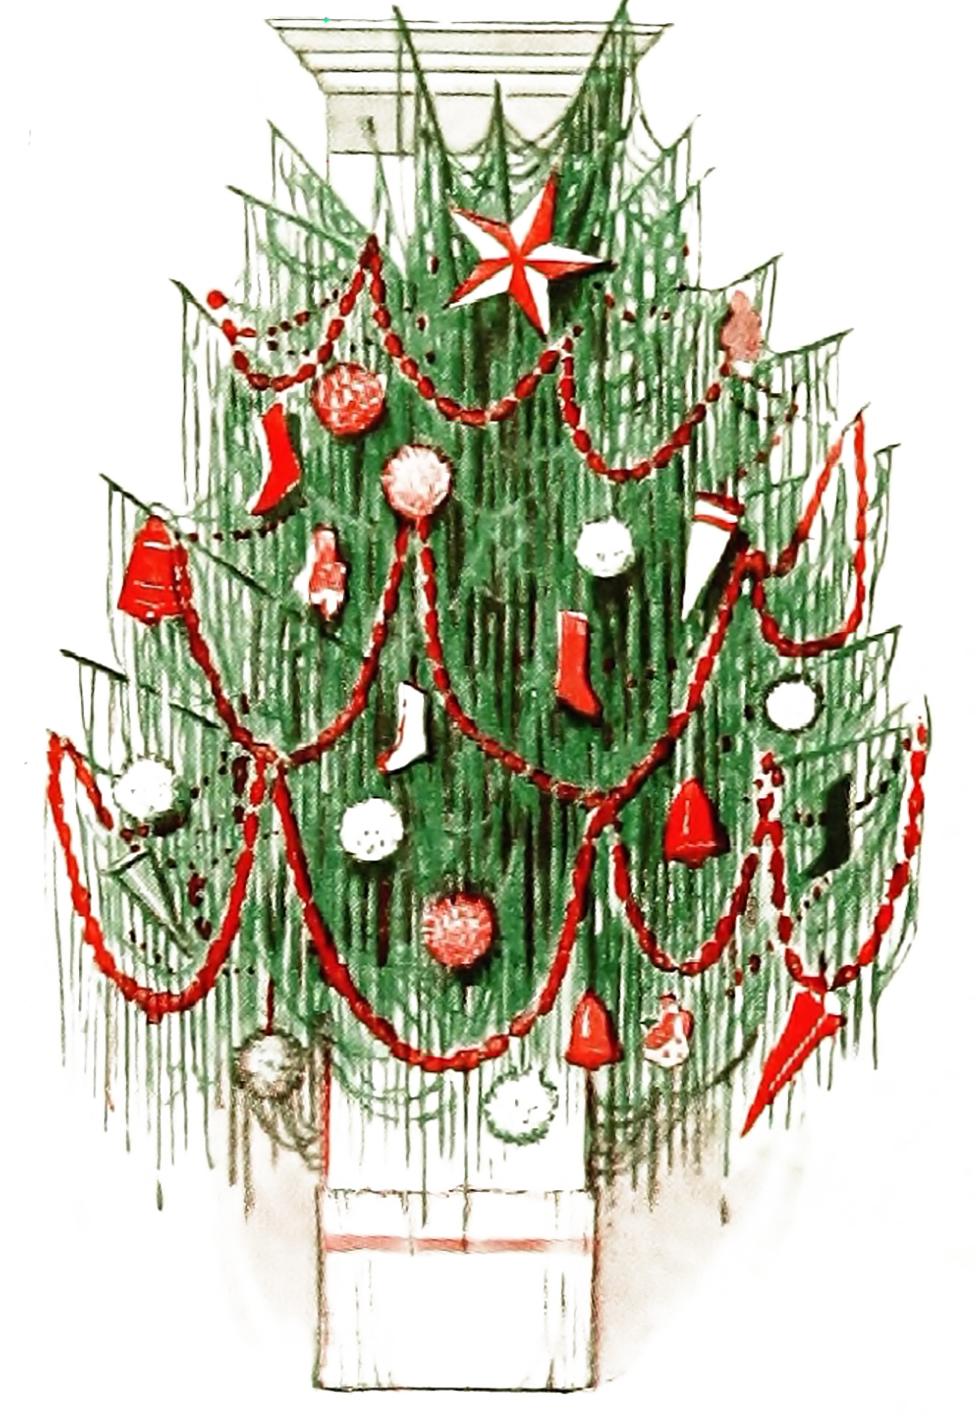 Vintage Christmas Illustrations.Vintage Christmas Clip Art Illustrations The Graffical Muse